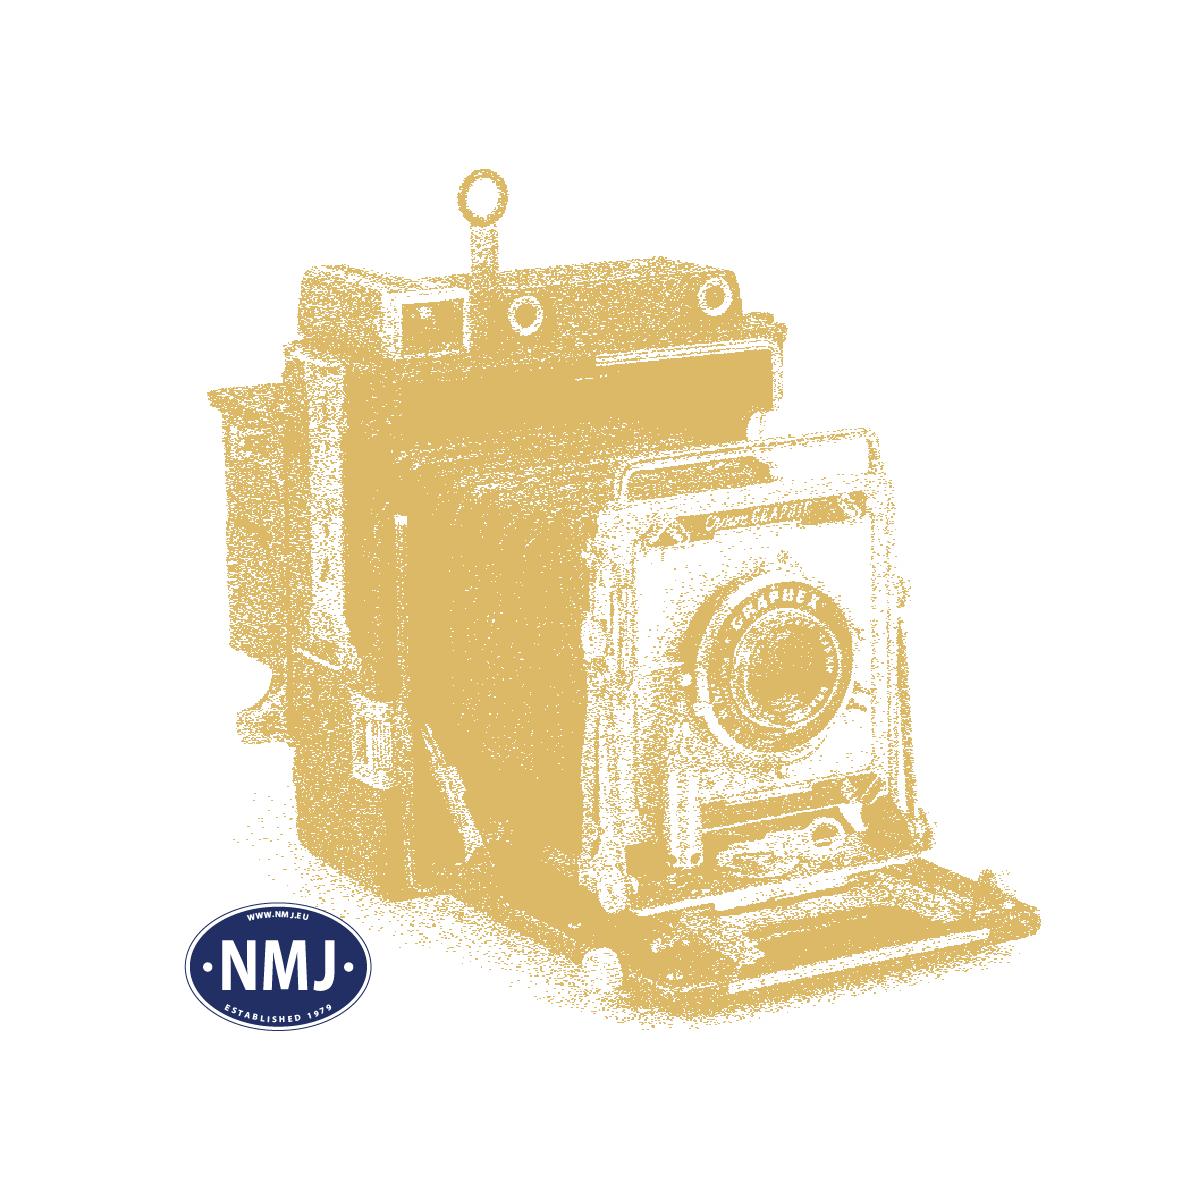 MBR54-0205 - Statisk Gress, Gressbrun, 50g, 2mm